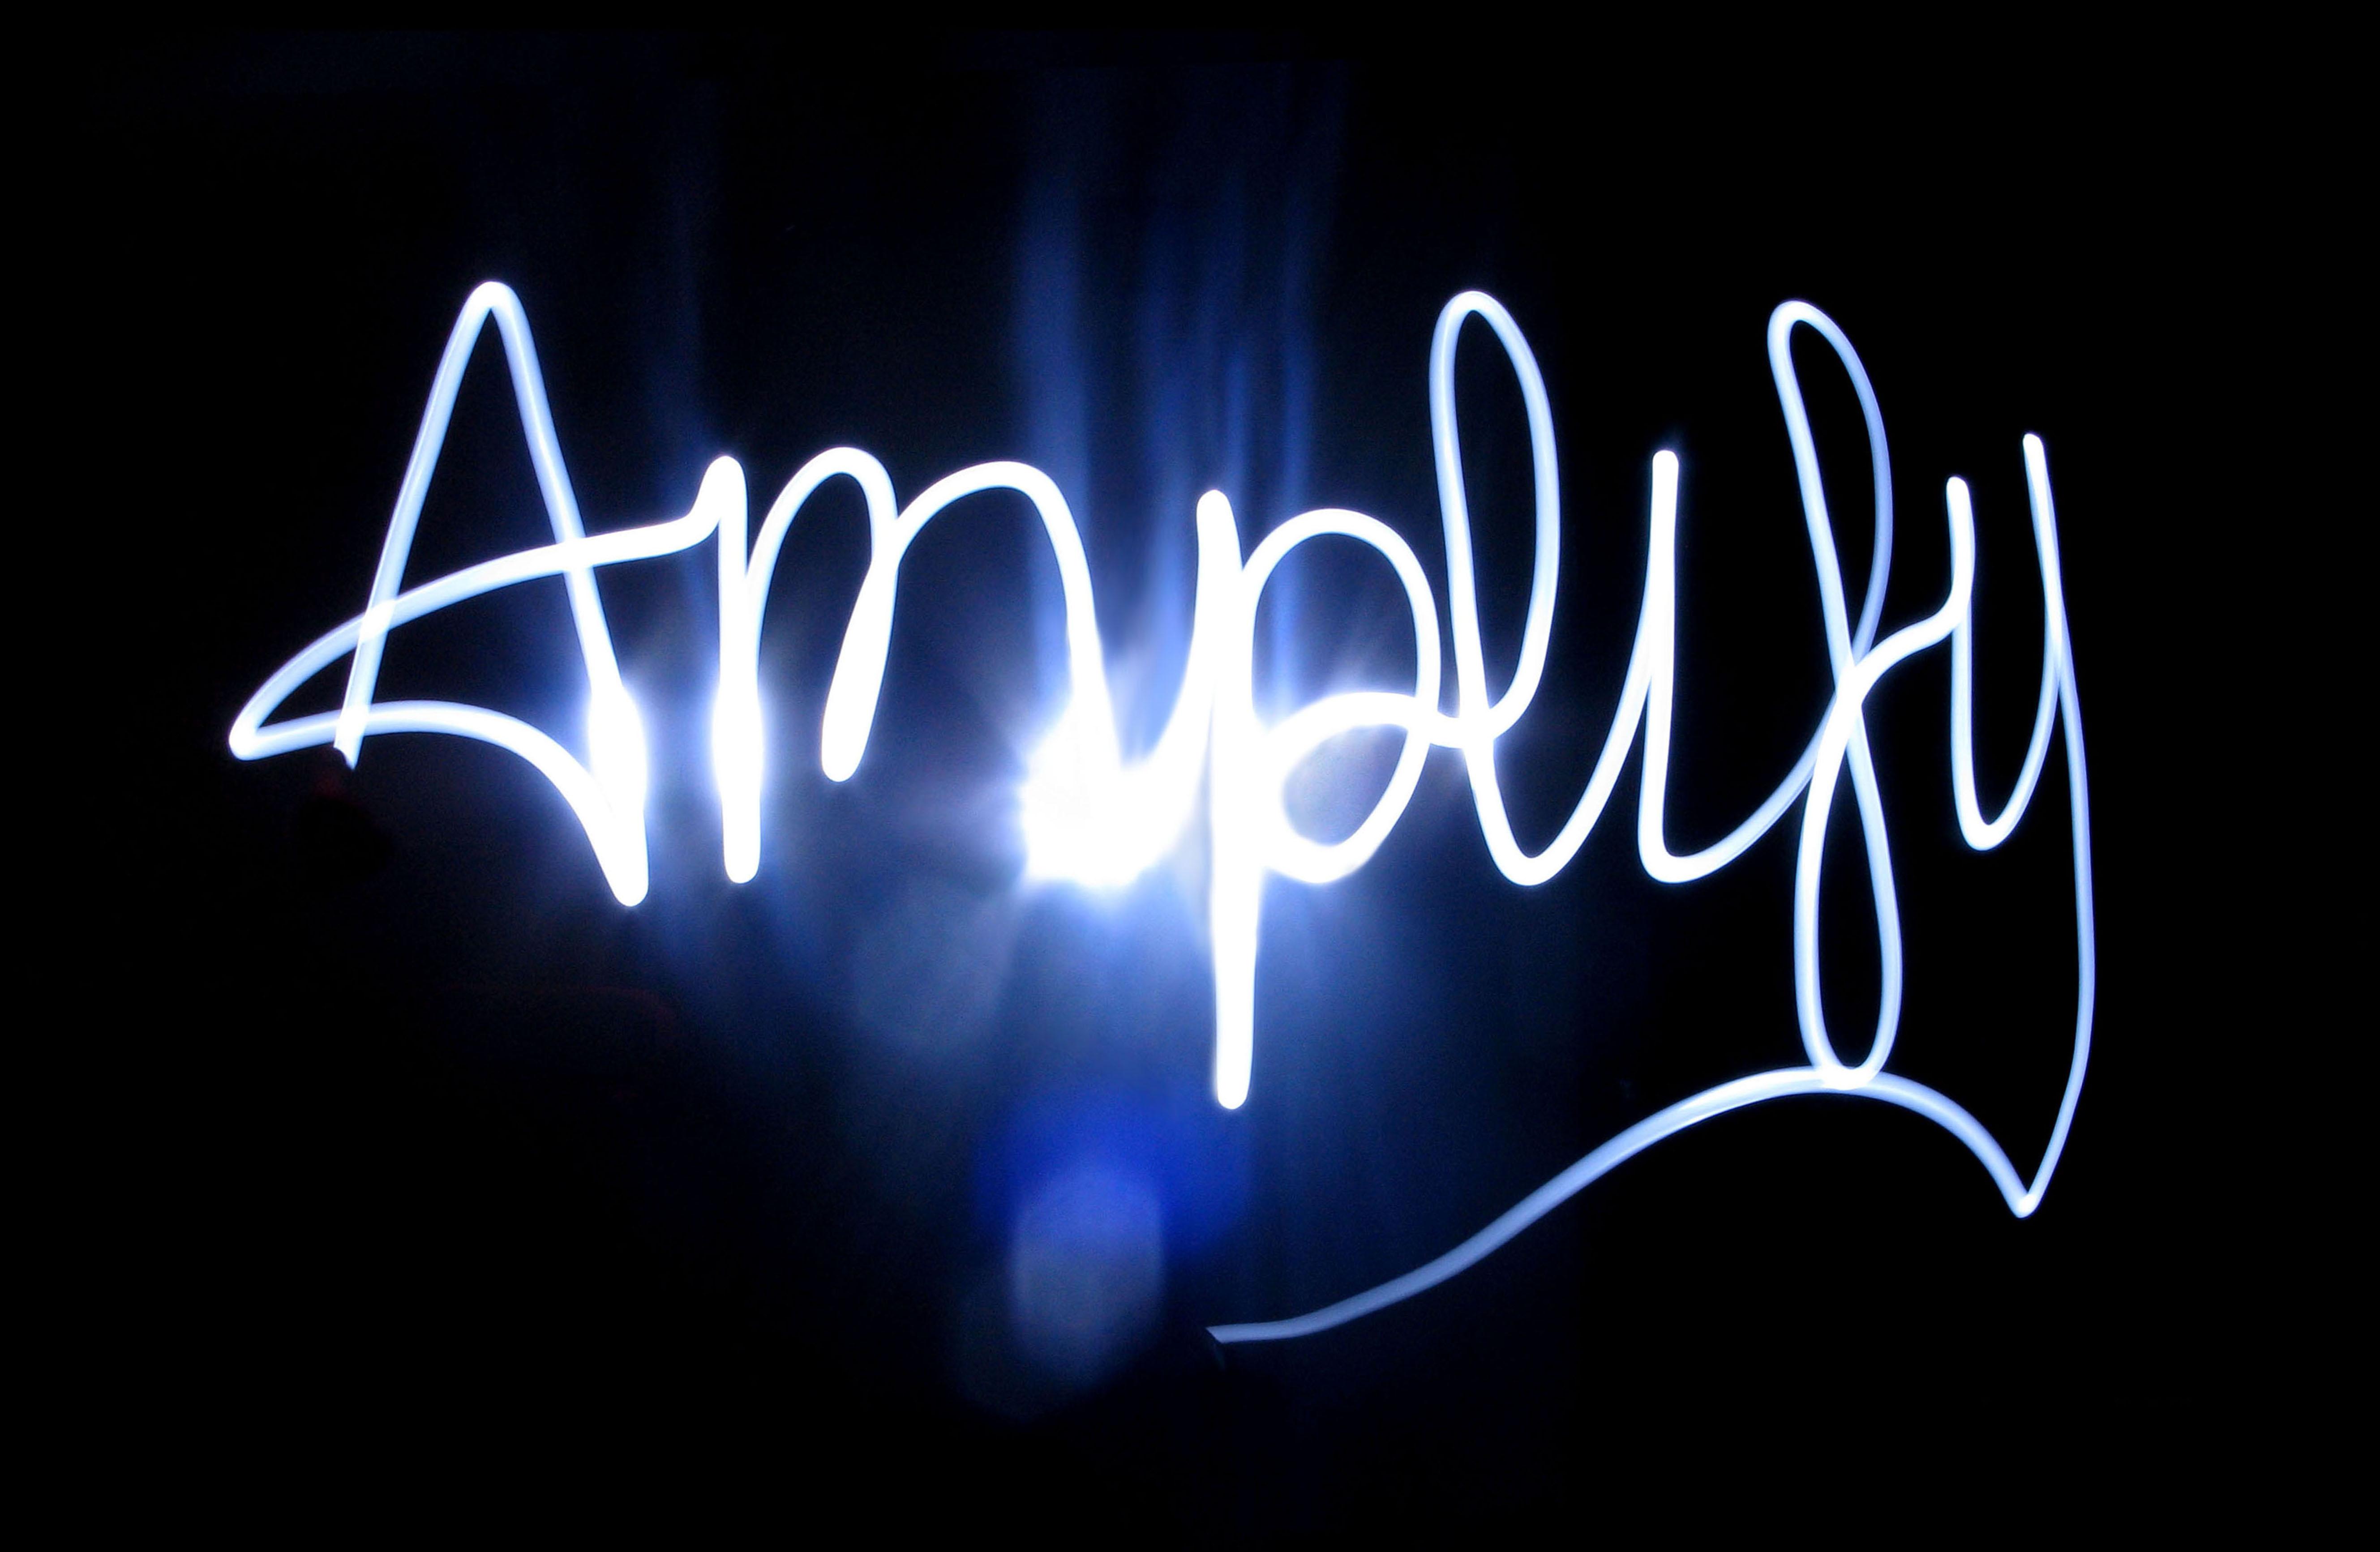 http://amplifyfestival.com.au